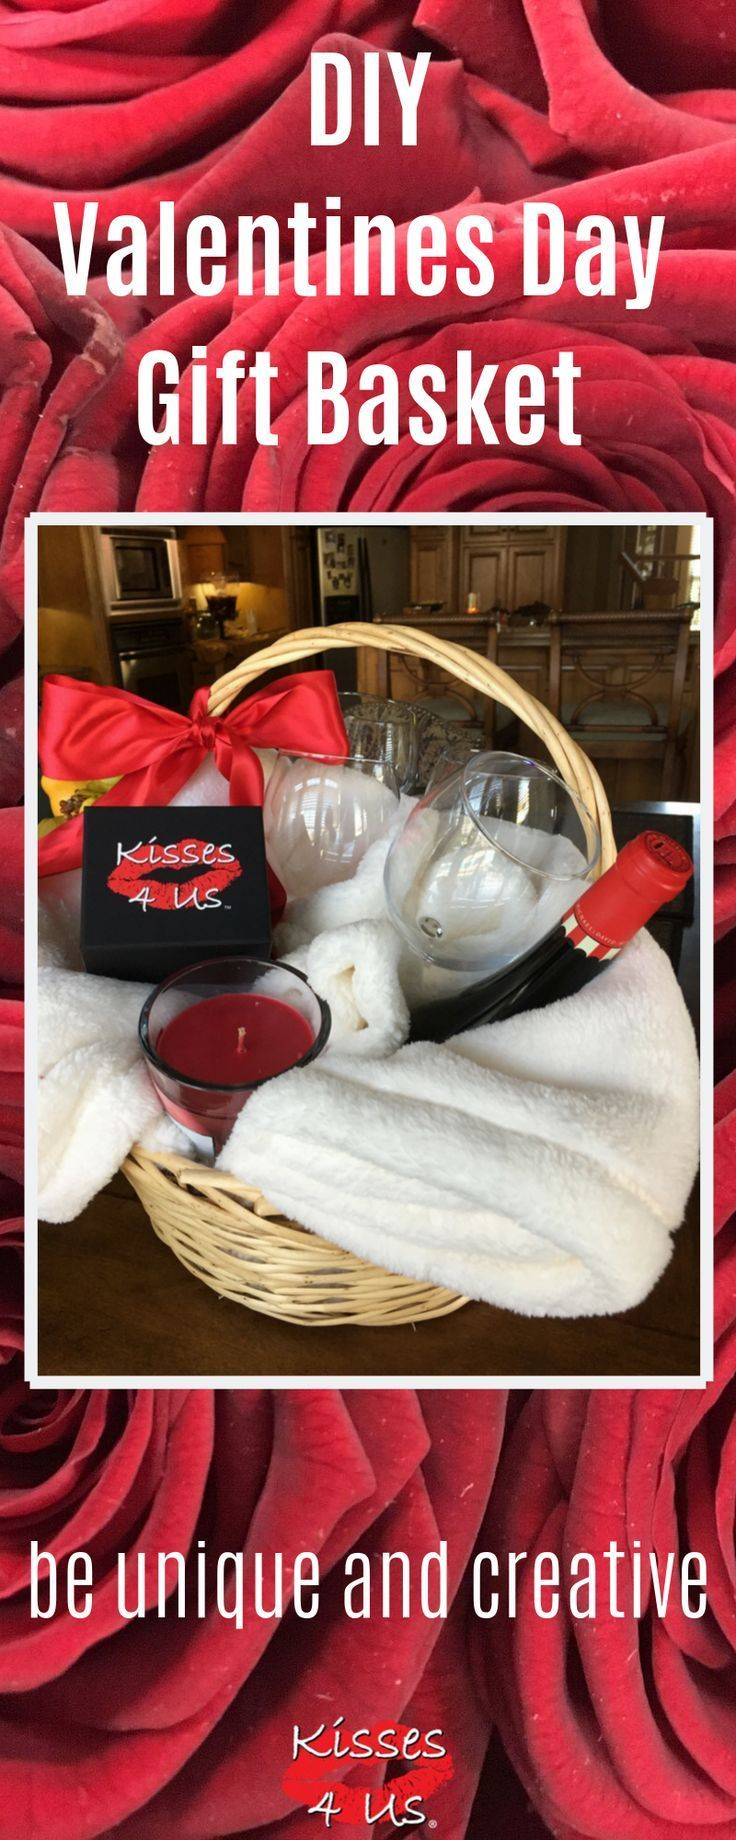 Diy romantic gift basket valentines day gift baskets